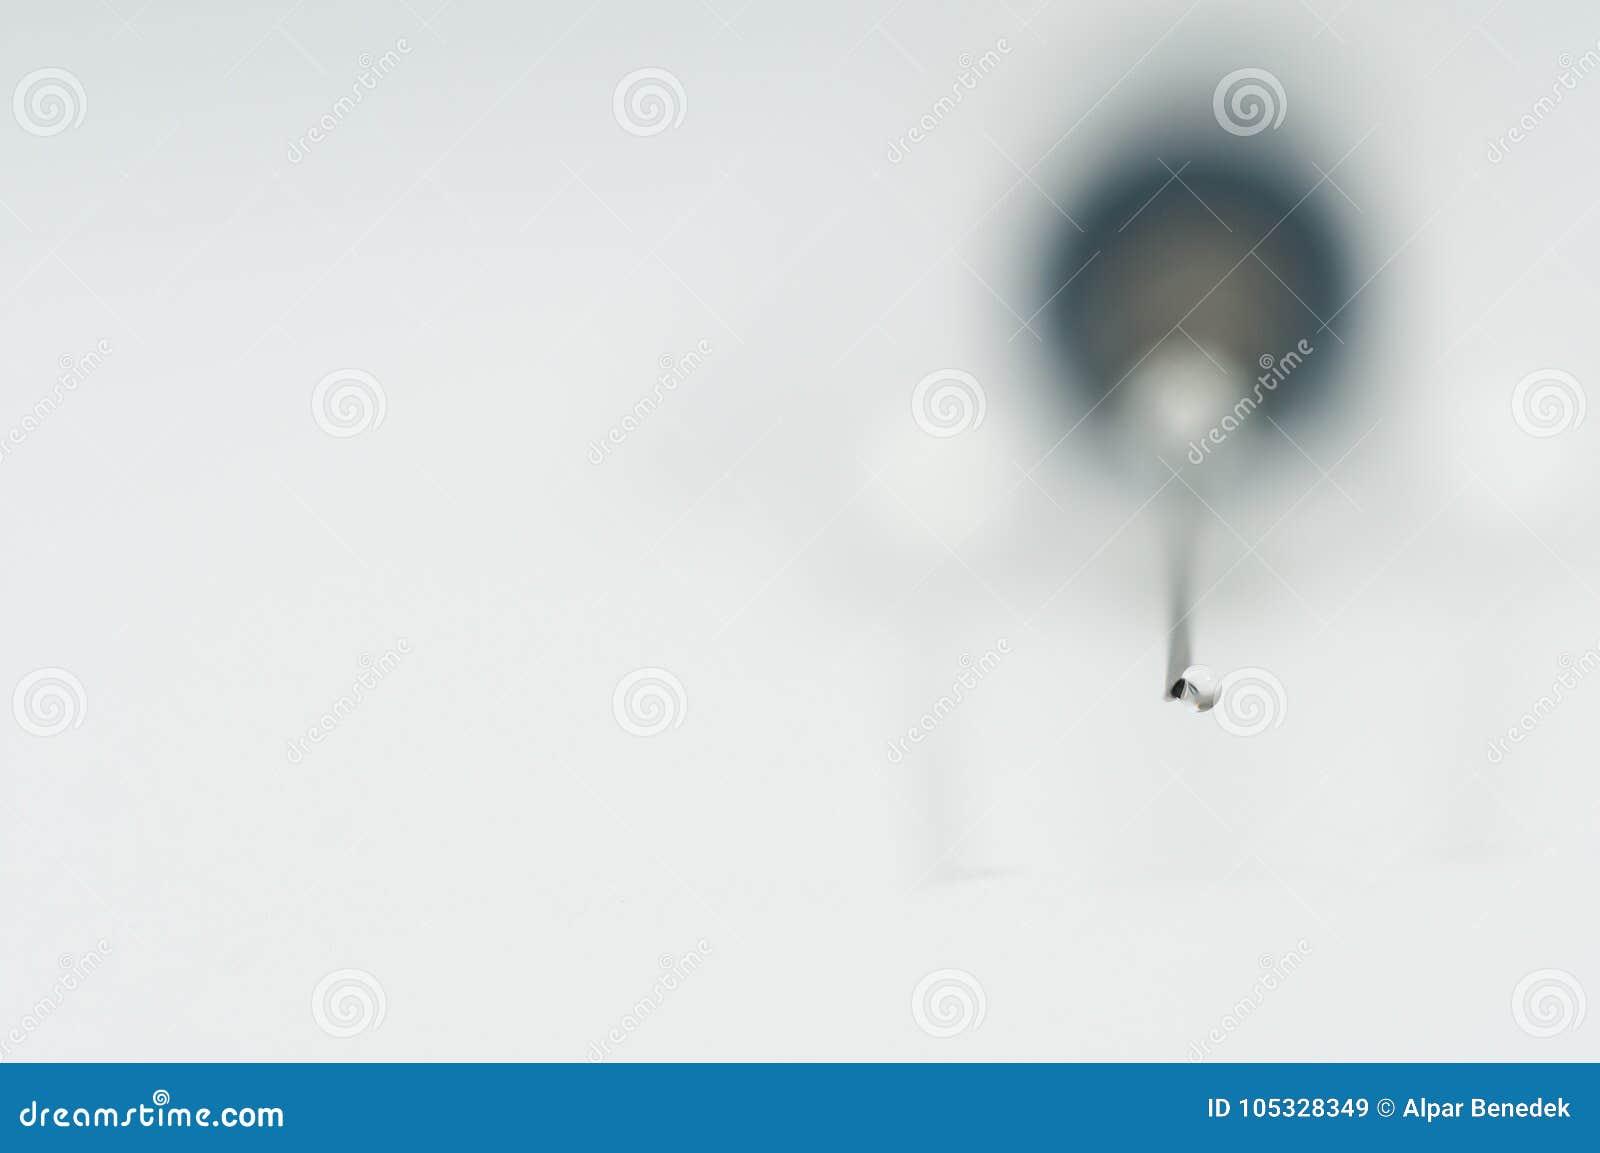 Plastic syringe with needle, focus on the liquid drop.